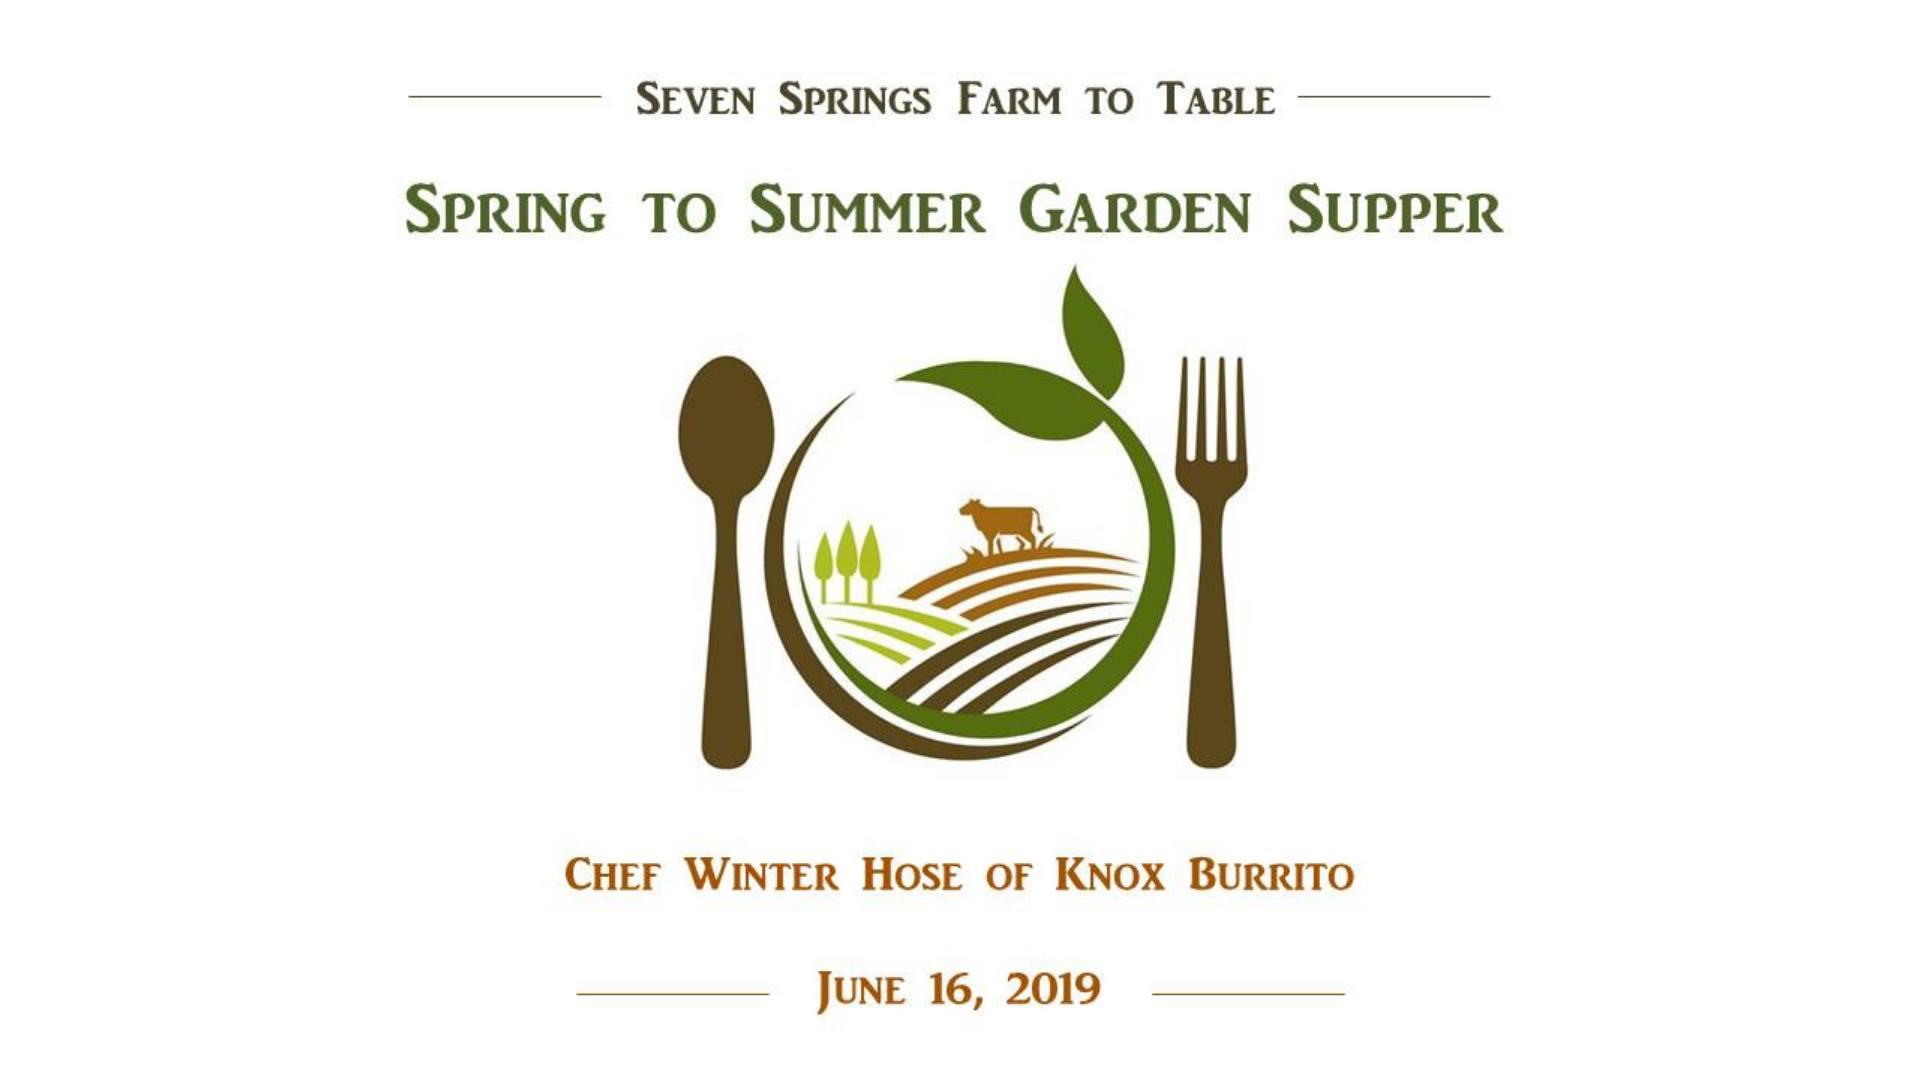 Seven Springs Farm  1472 Highway 61 E, Maynardville, Tennessee 37807